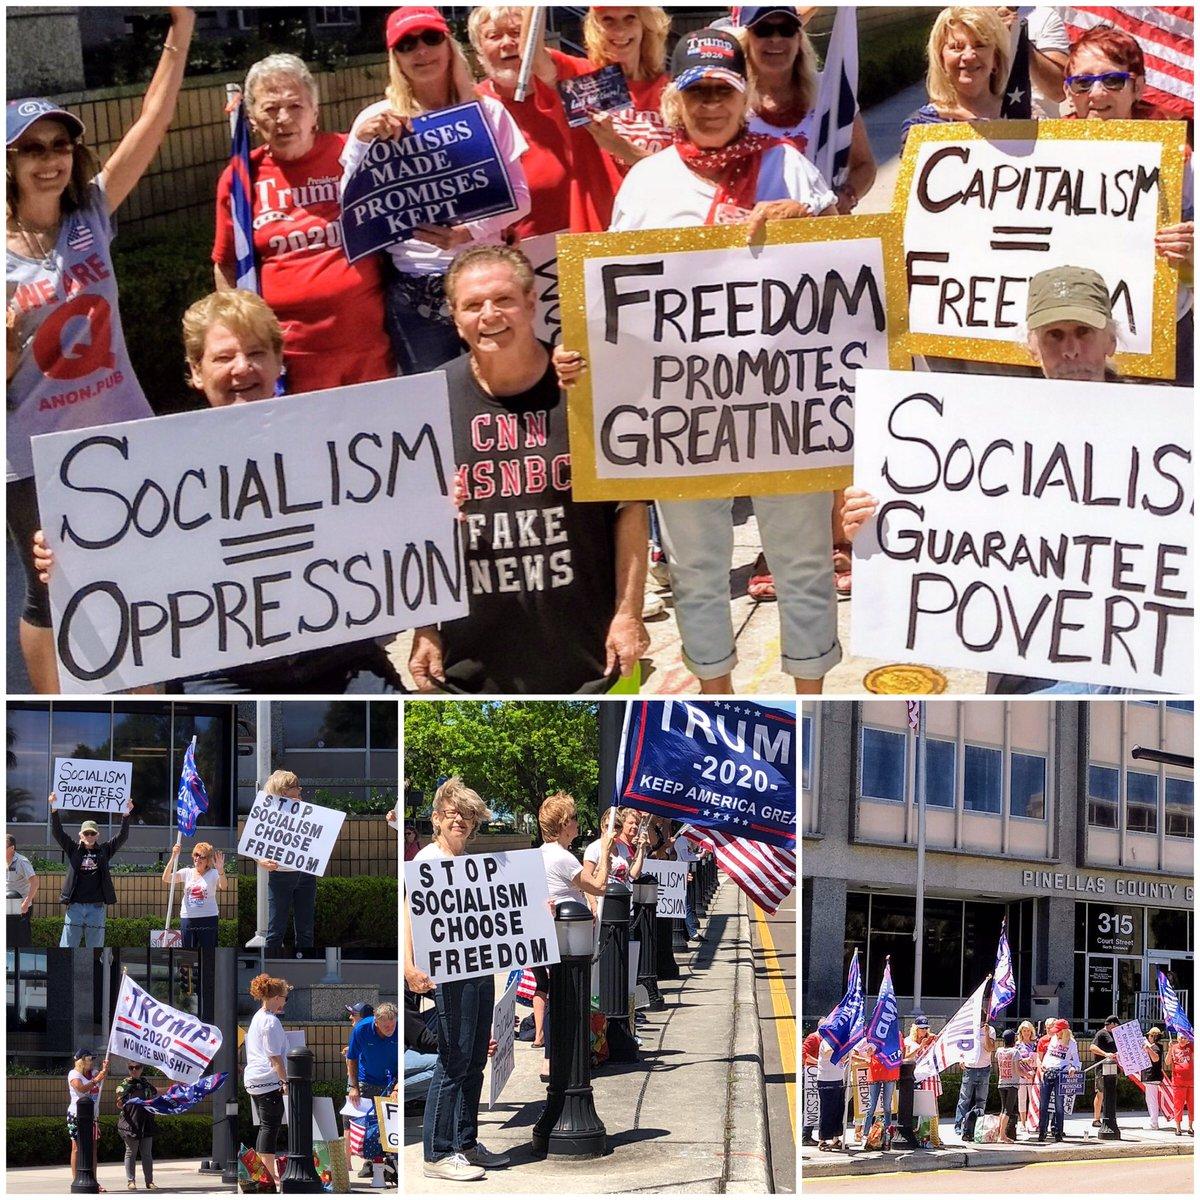 April 15-18 I had my Sign Waving CW Fla. Other #TeaParty Rallies going on all over  Message was #stopsocialism   #ChooseFreedom @TeaParty10 @jennybethm @PJMedia_com @realDonaldTrump @RealJamesWoods @charliekirk11 @mitchellvii @mayalates @GKeile @AlohaHa59067534 @DatoFreddy<br>http://pic.twitter.com/znGJyeFBk6